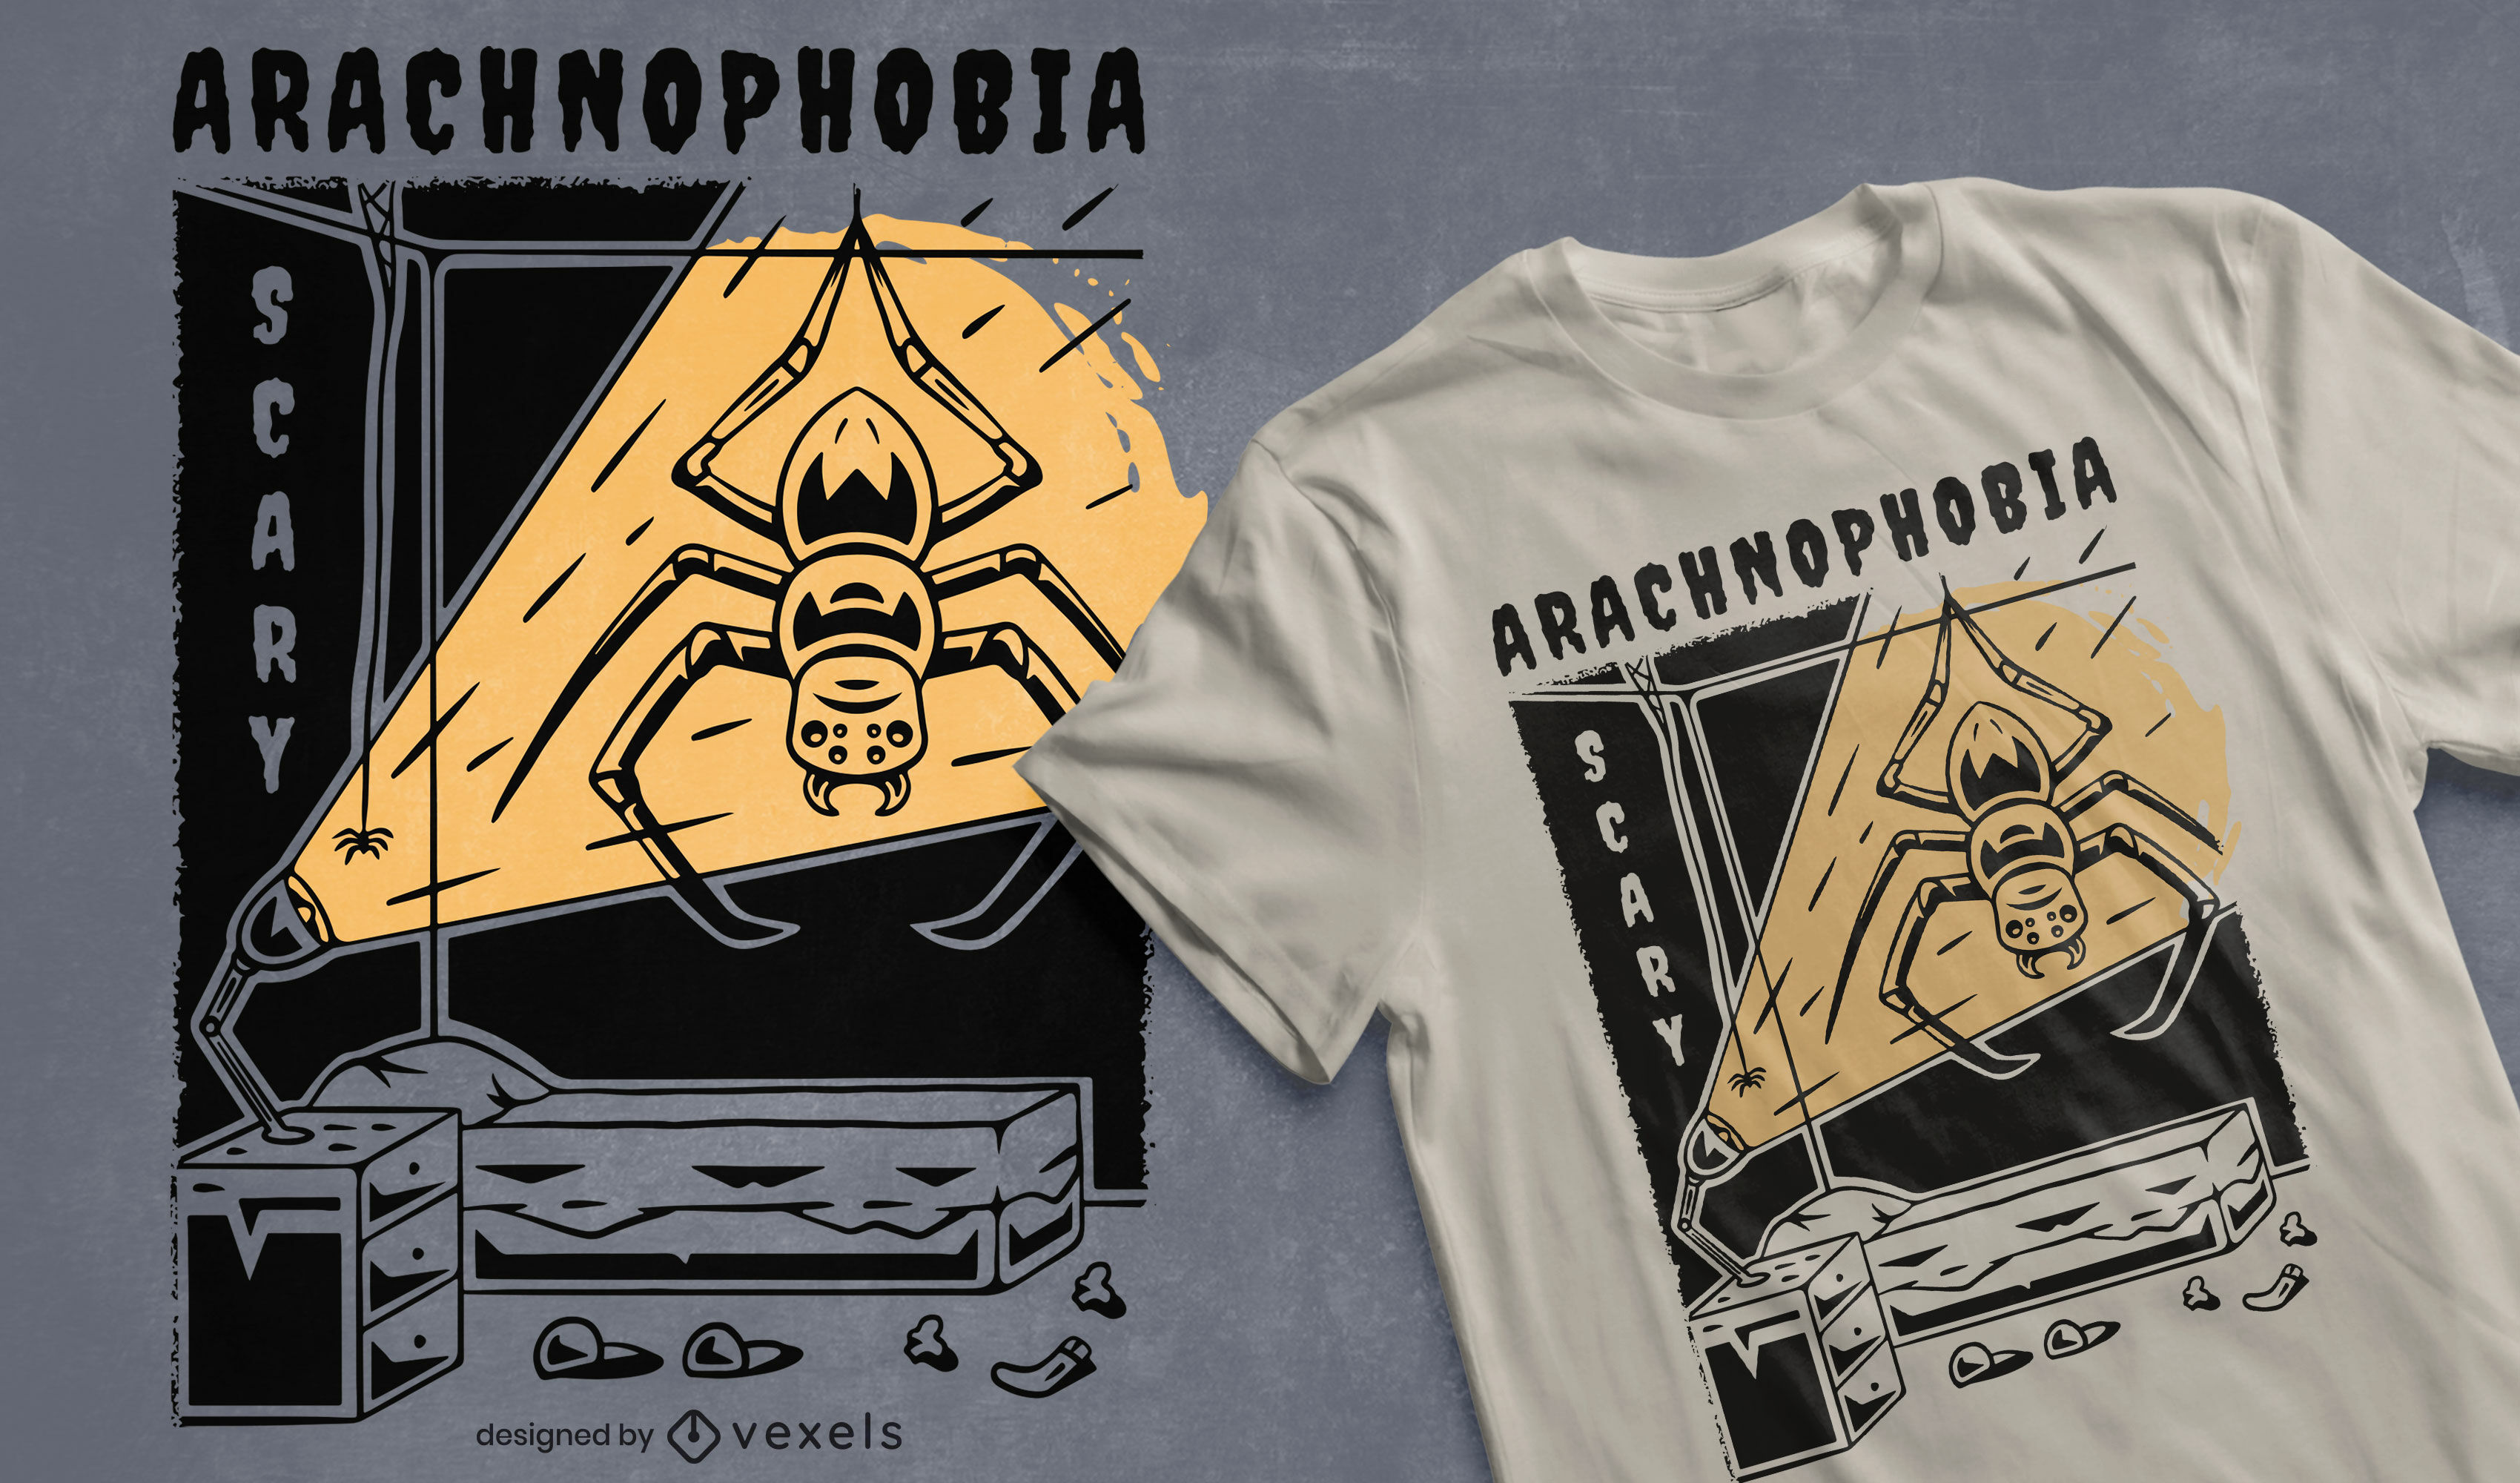 Dise?o de camiseta espeluznante Arachnophobia